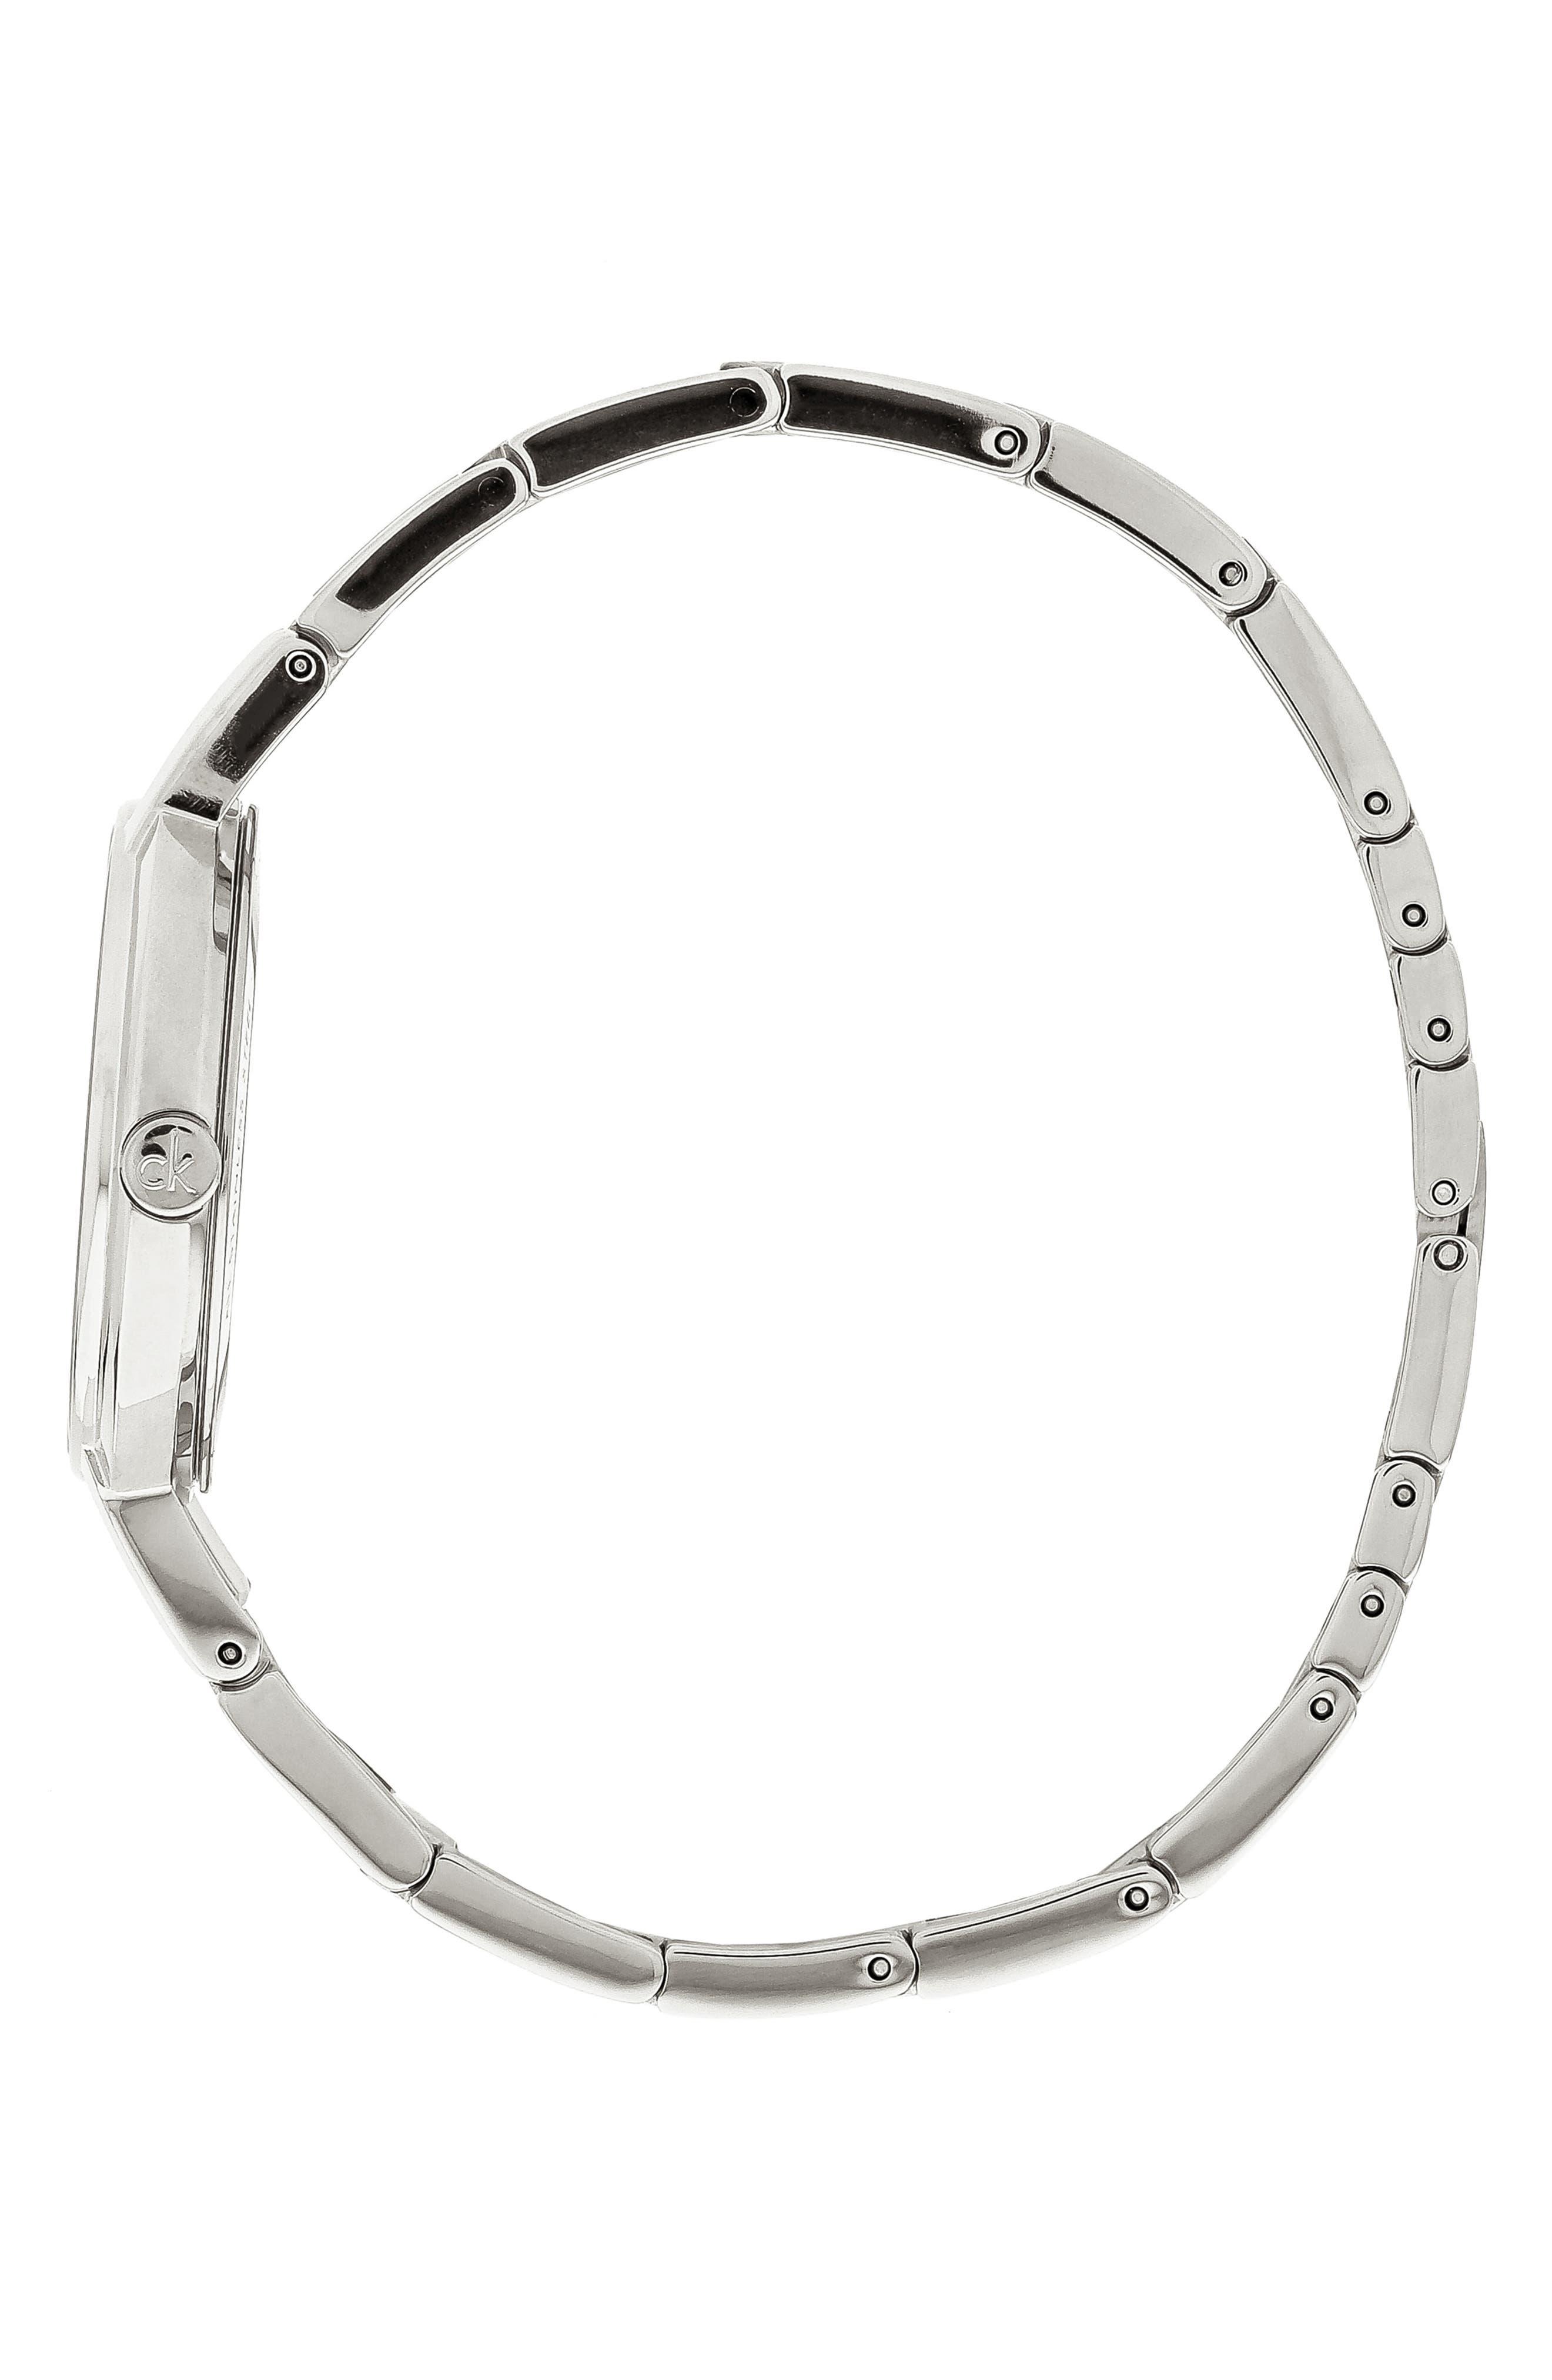 CALVIN KLEIN, Cheers Bracelet Watch, 32mm, Alternate thumbnail 3, color, SILVER/ BLACK/ SILVER